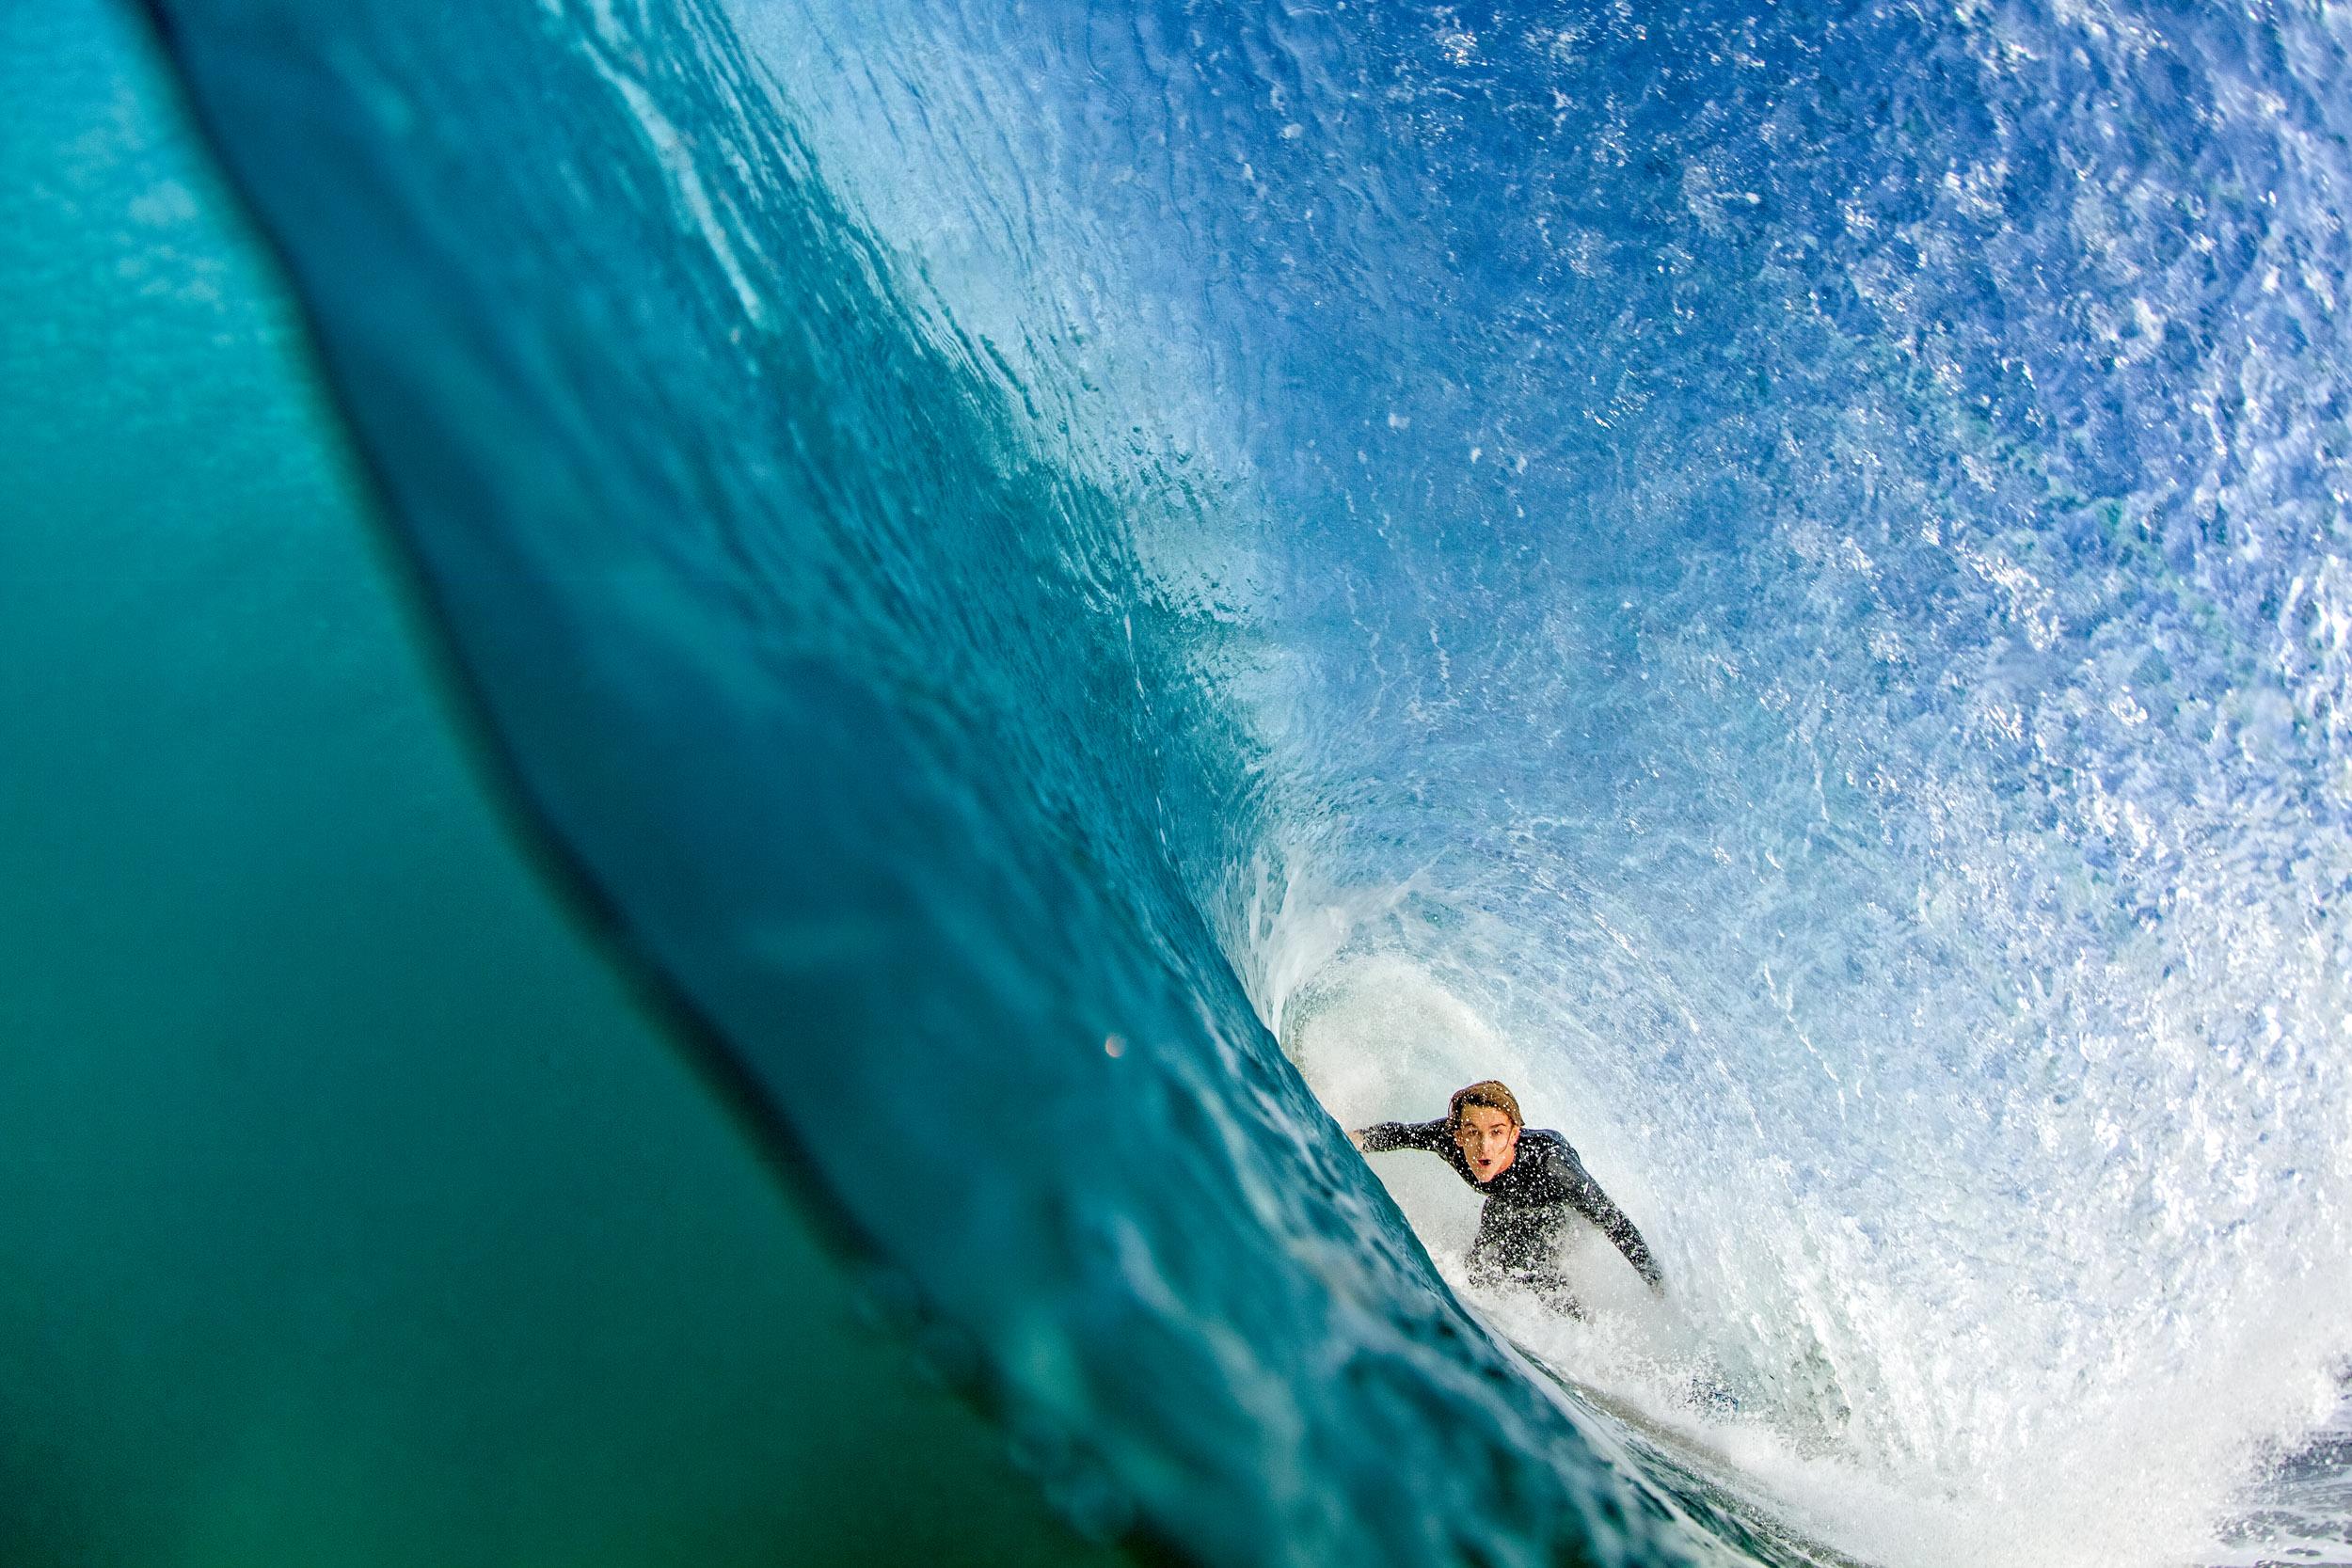 split-level-barrel-shot-surf-photos-S4116-209.jpg